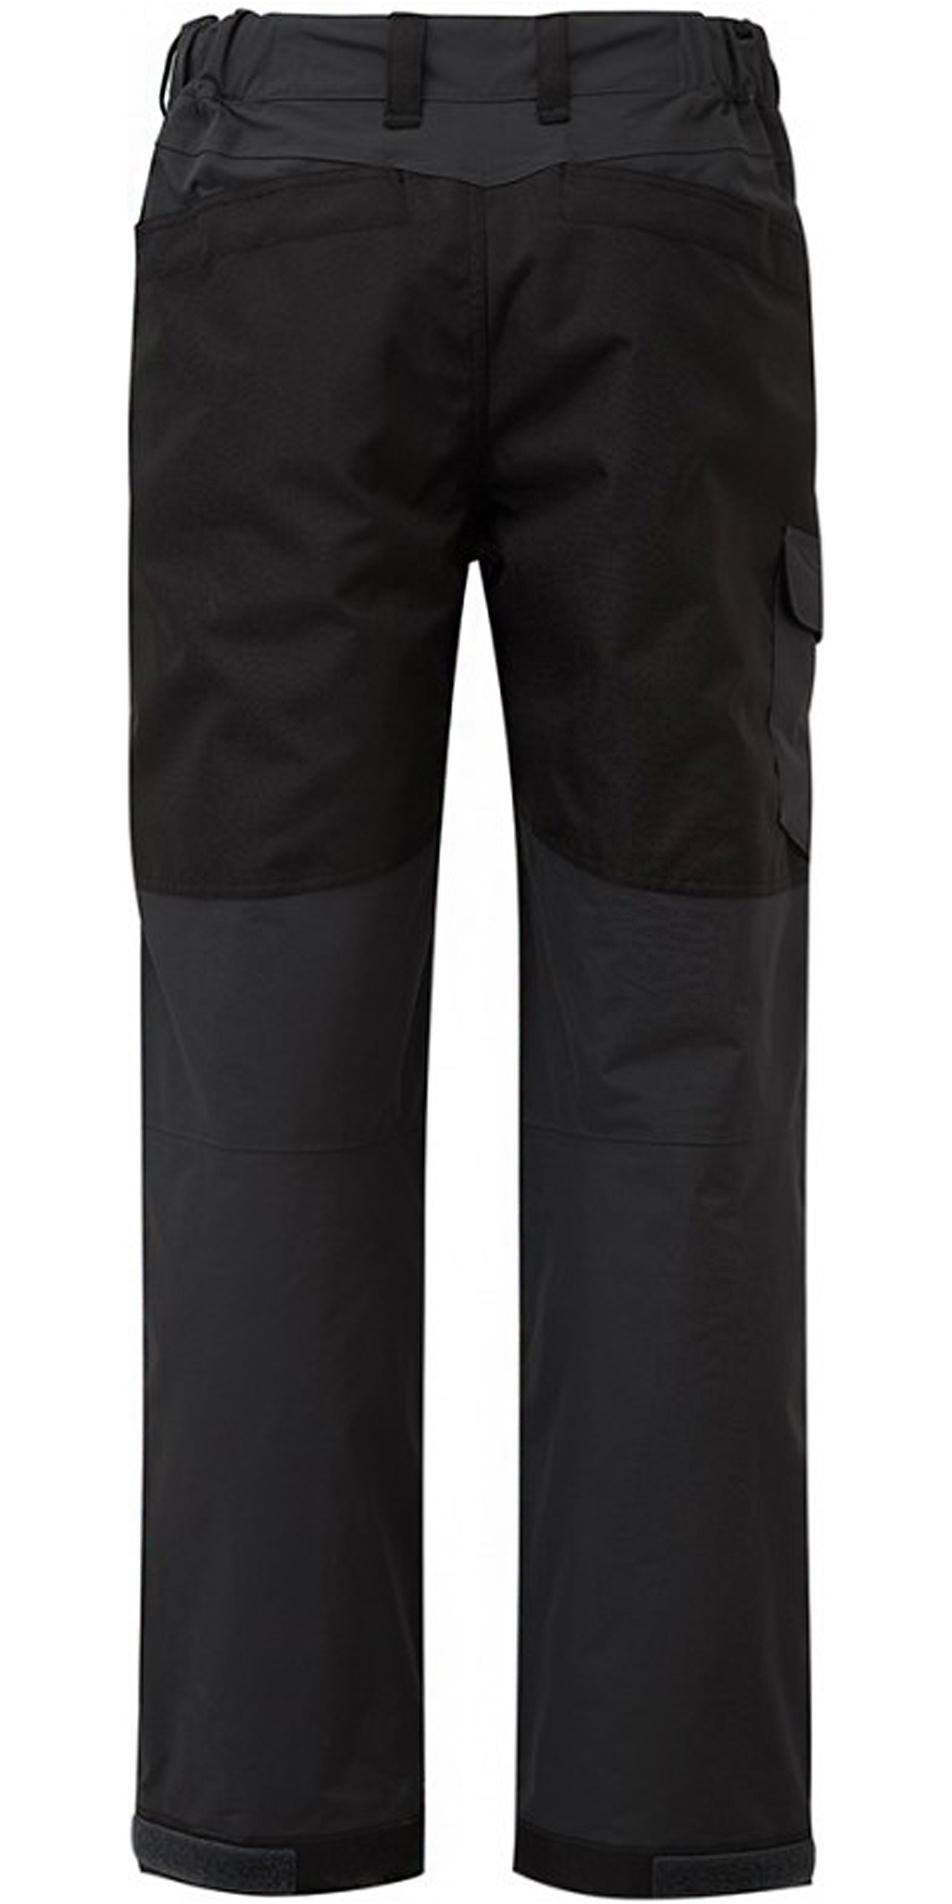 2019 Gill Mens OS3 Coastal Sailing Trousers Graphite OS31P